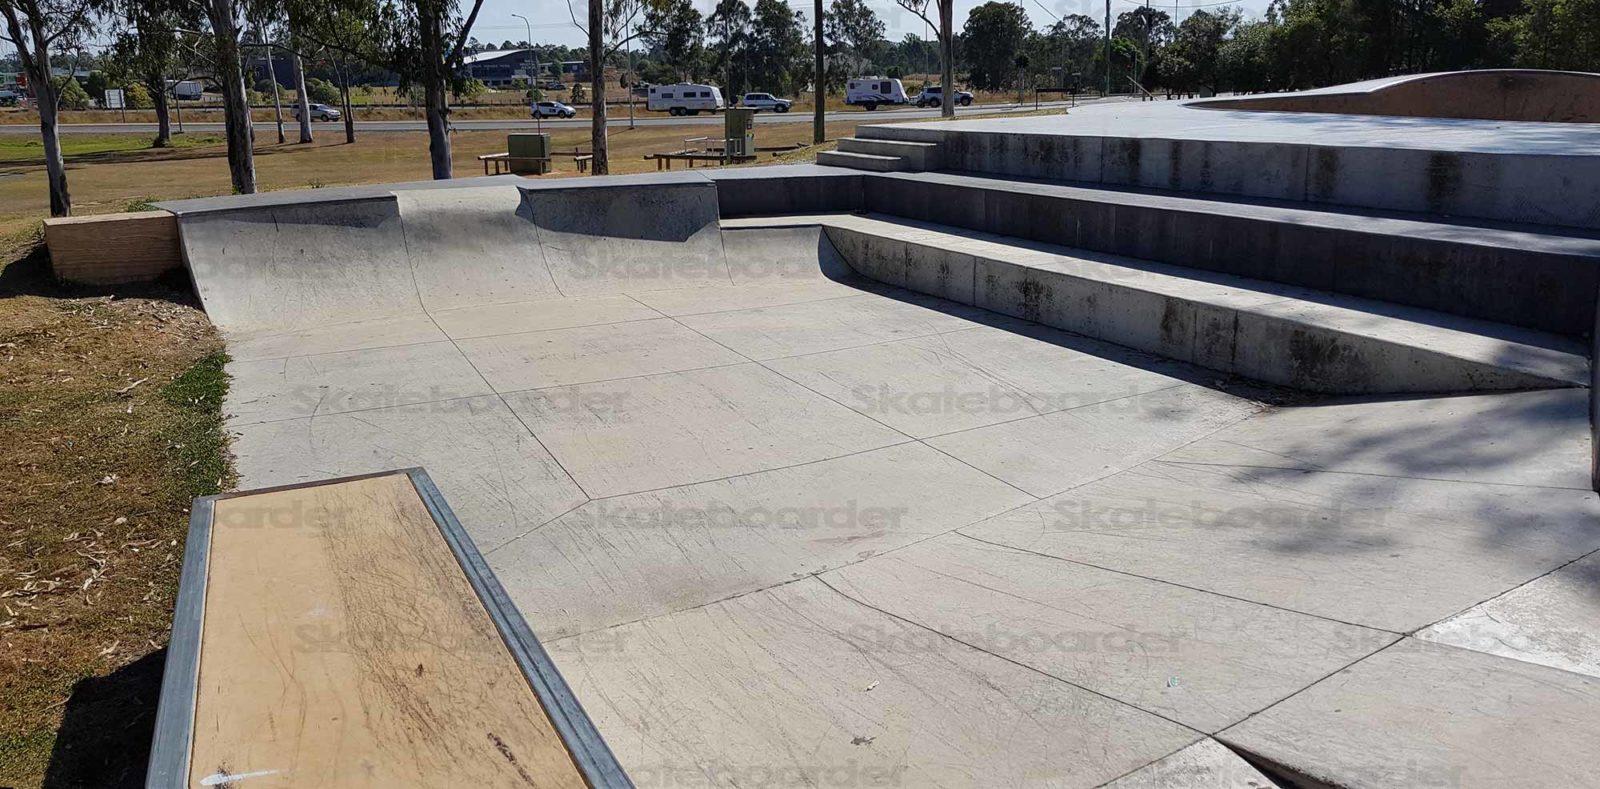 New Street elements at Jimboomba Skatepark